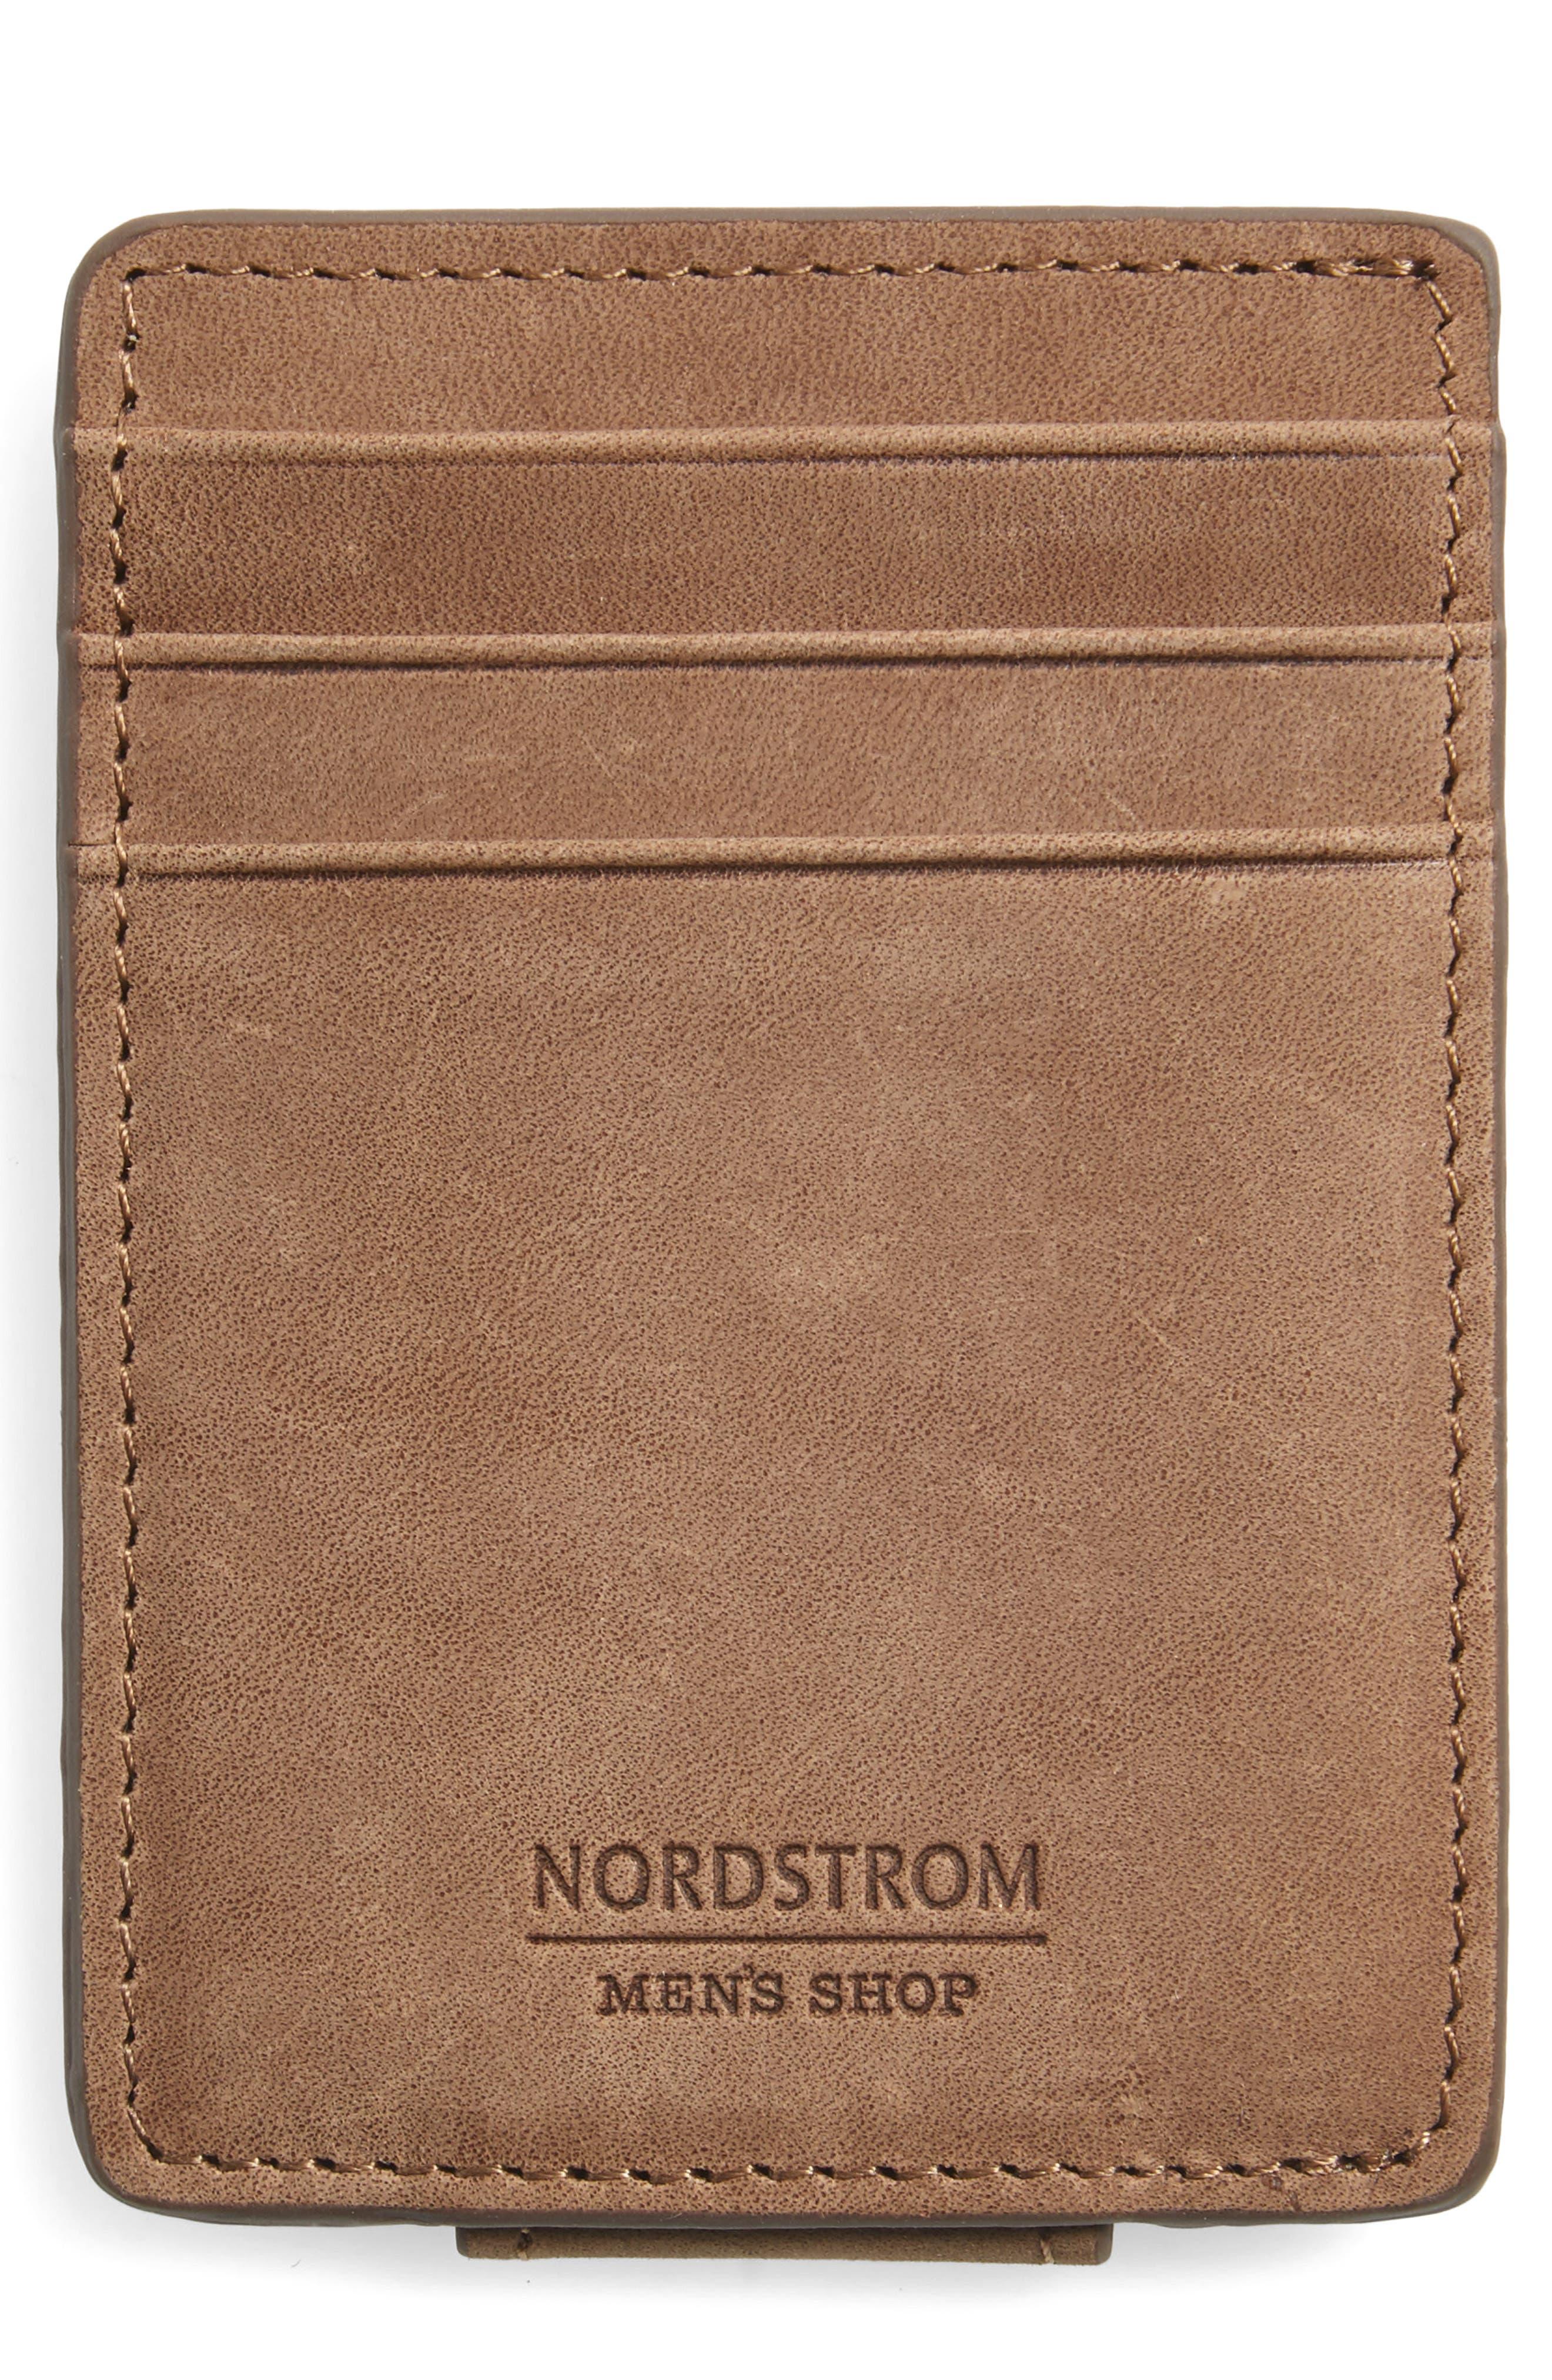 Nordstrom Men's Shop Upton Leather Money Clip Card Case